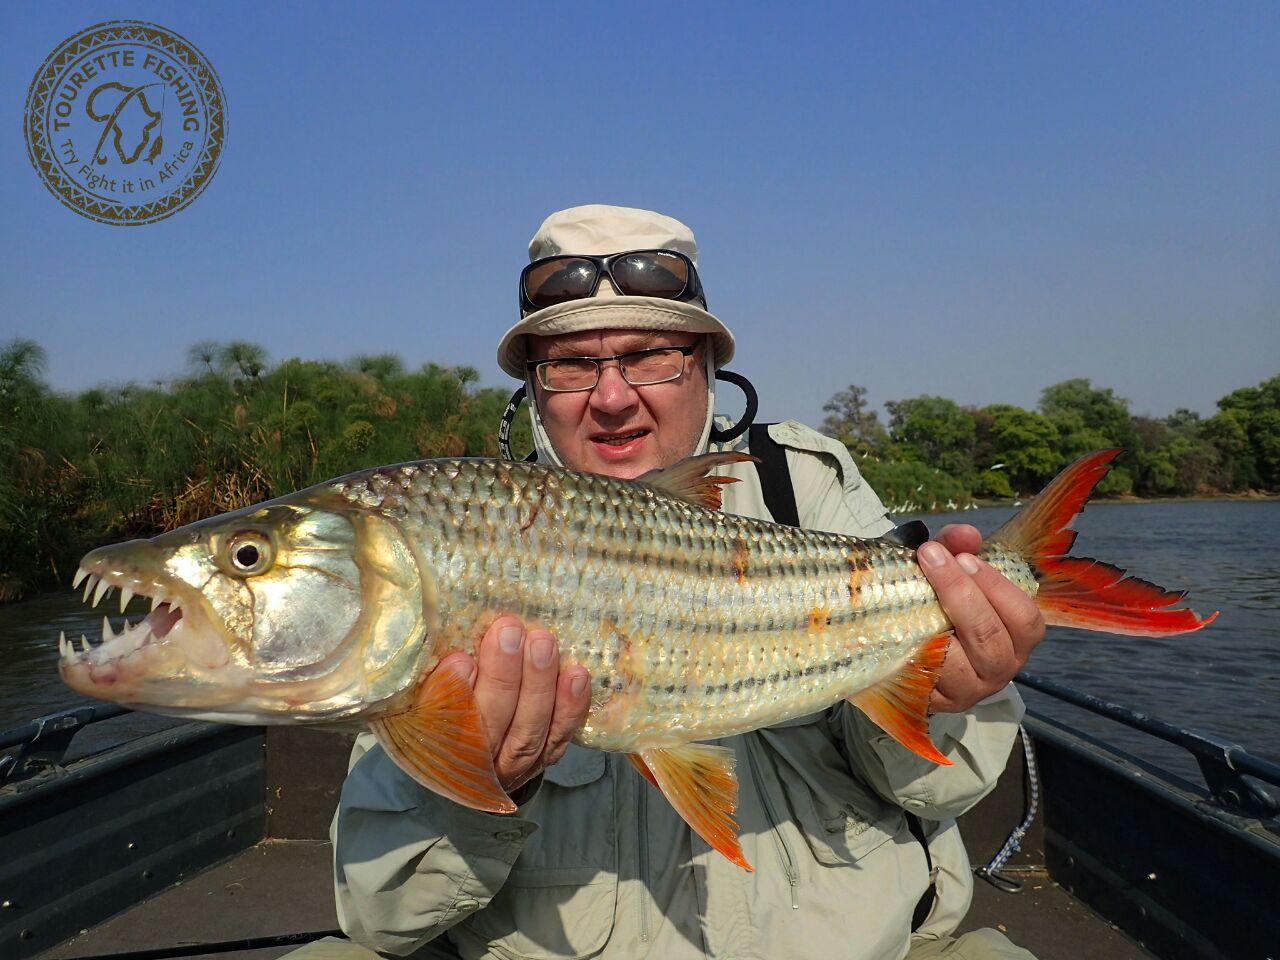 okavango-barbel-run-tigerfish-season-2016-grp-5-tourette-fishing-blog-jan